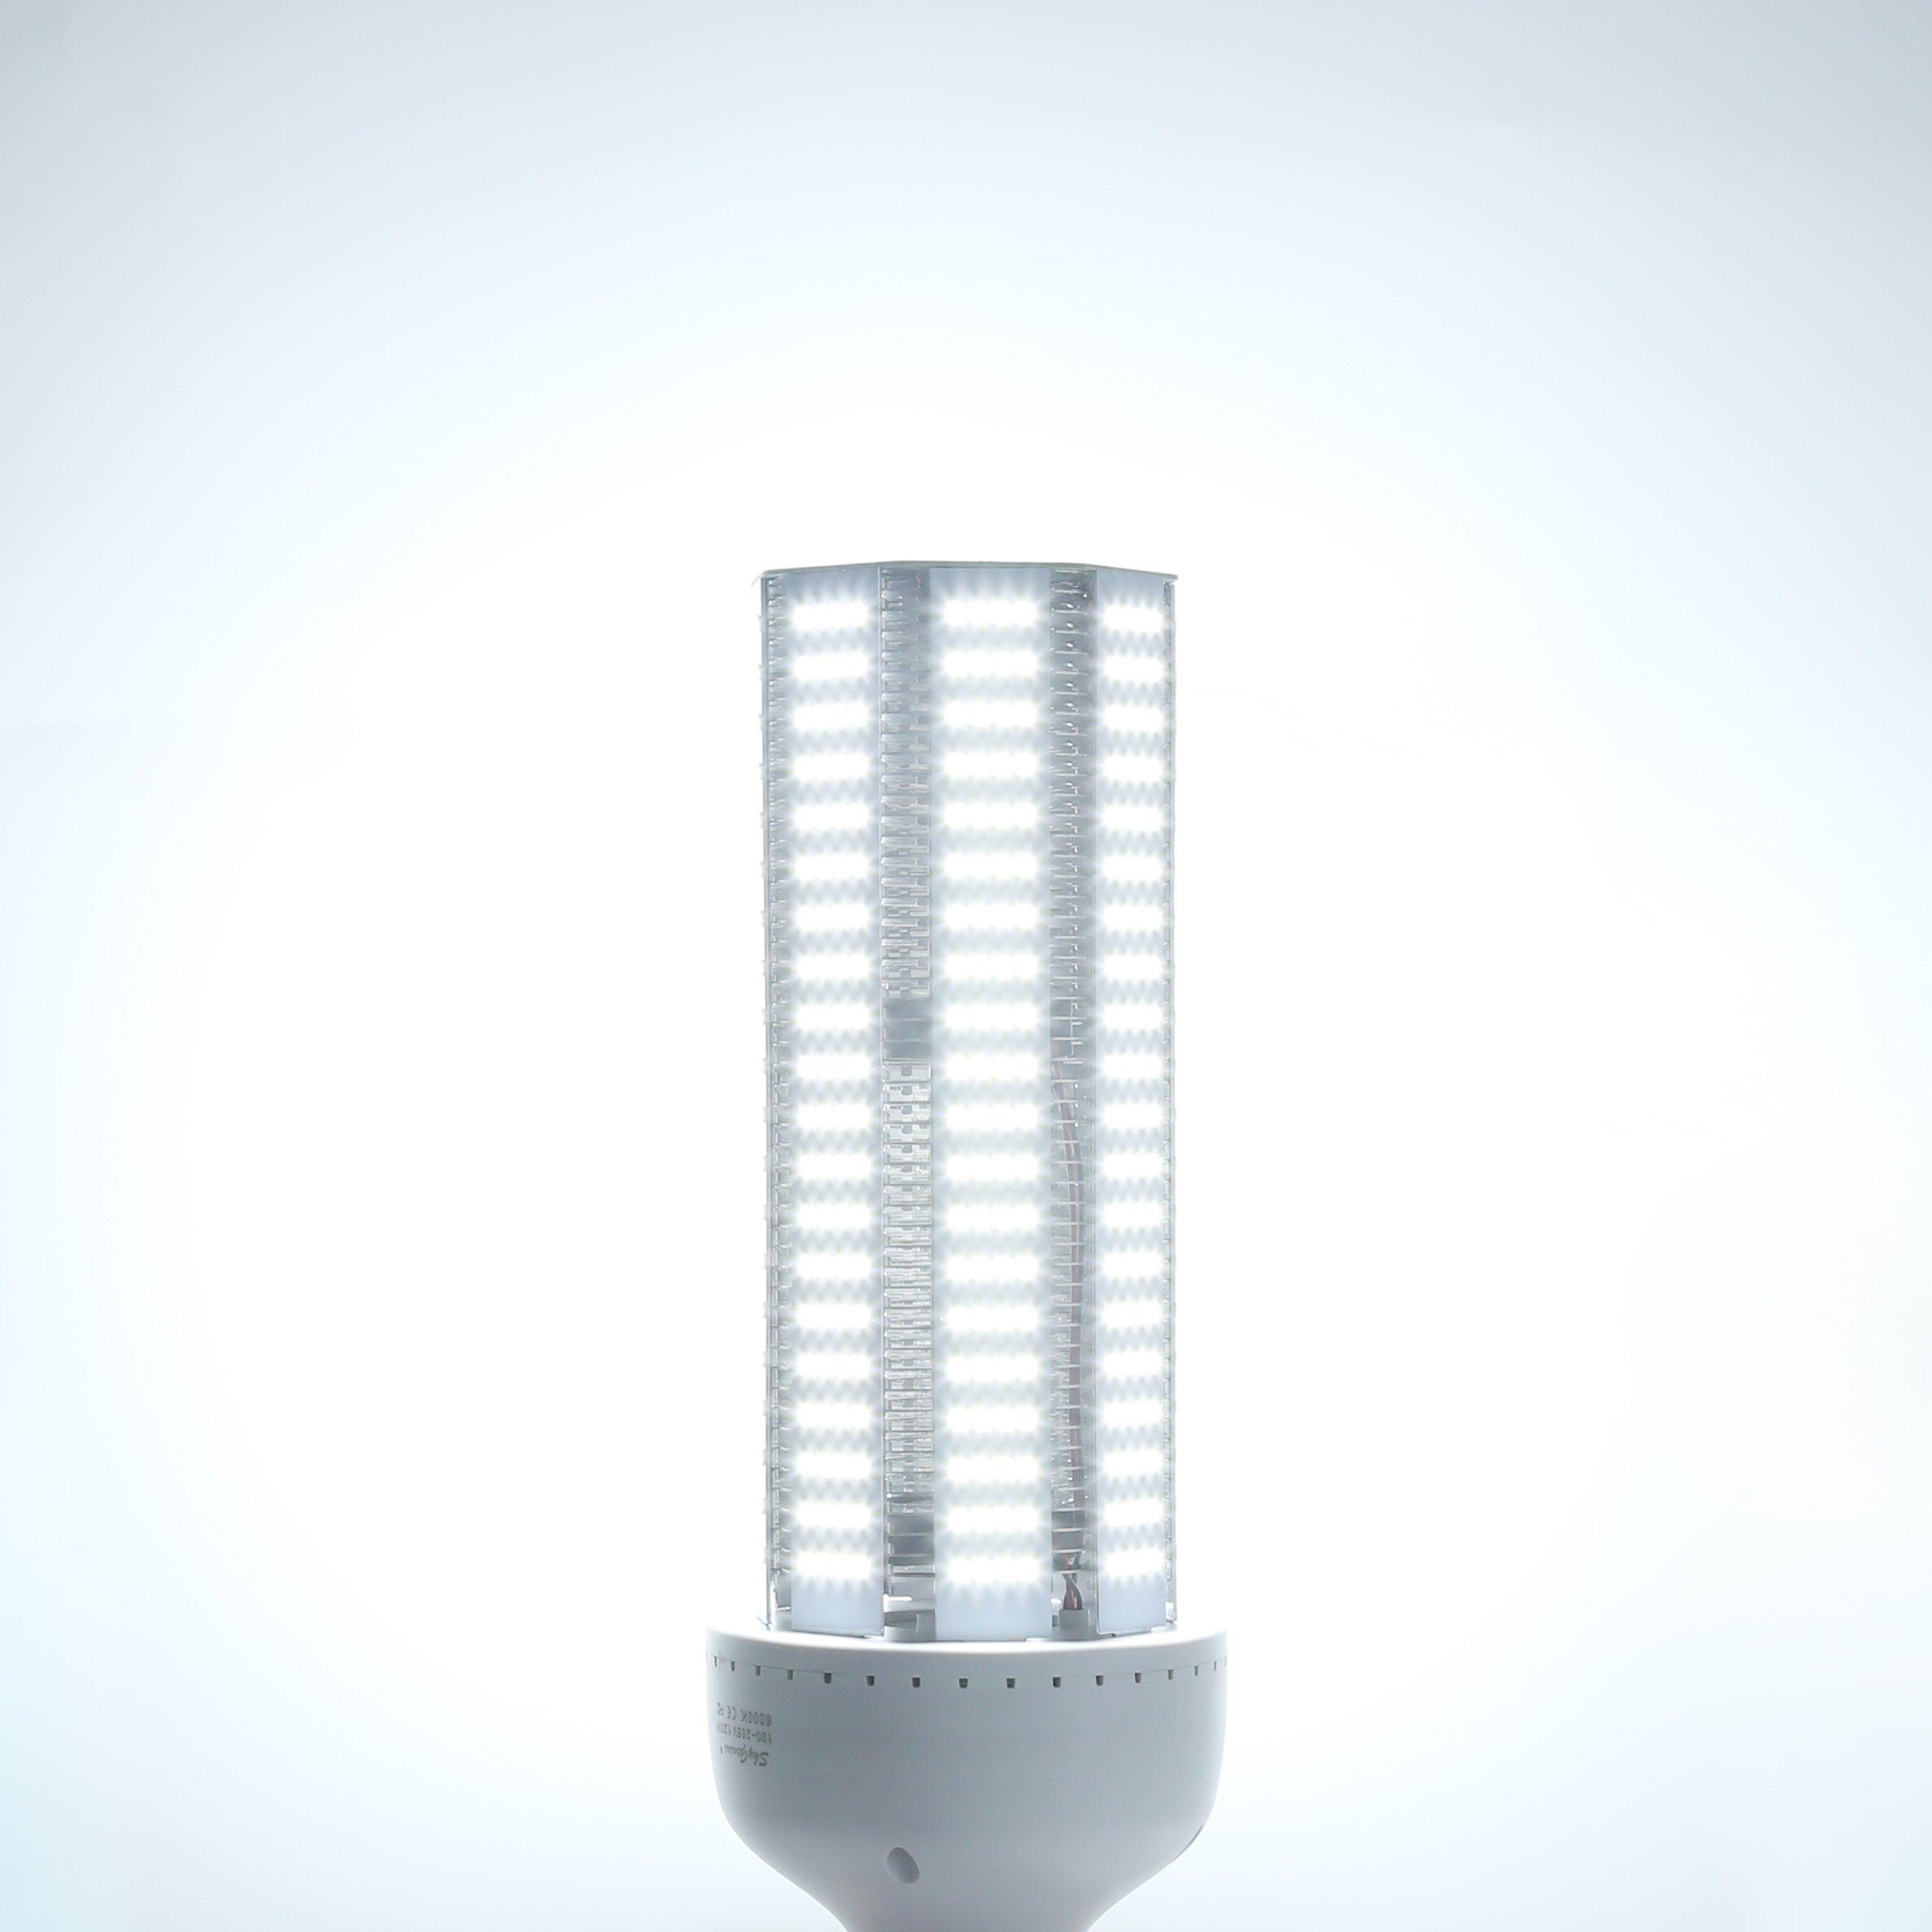 80W LED Corn Light Bulb(E39 Mogul Base)8000Lm 6500K Cool White,for Metal Halide HPS HID Replacement Garage Parking Lot High Bay Warehouse Street Lamp Lighting